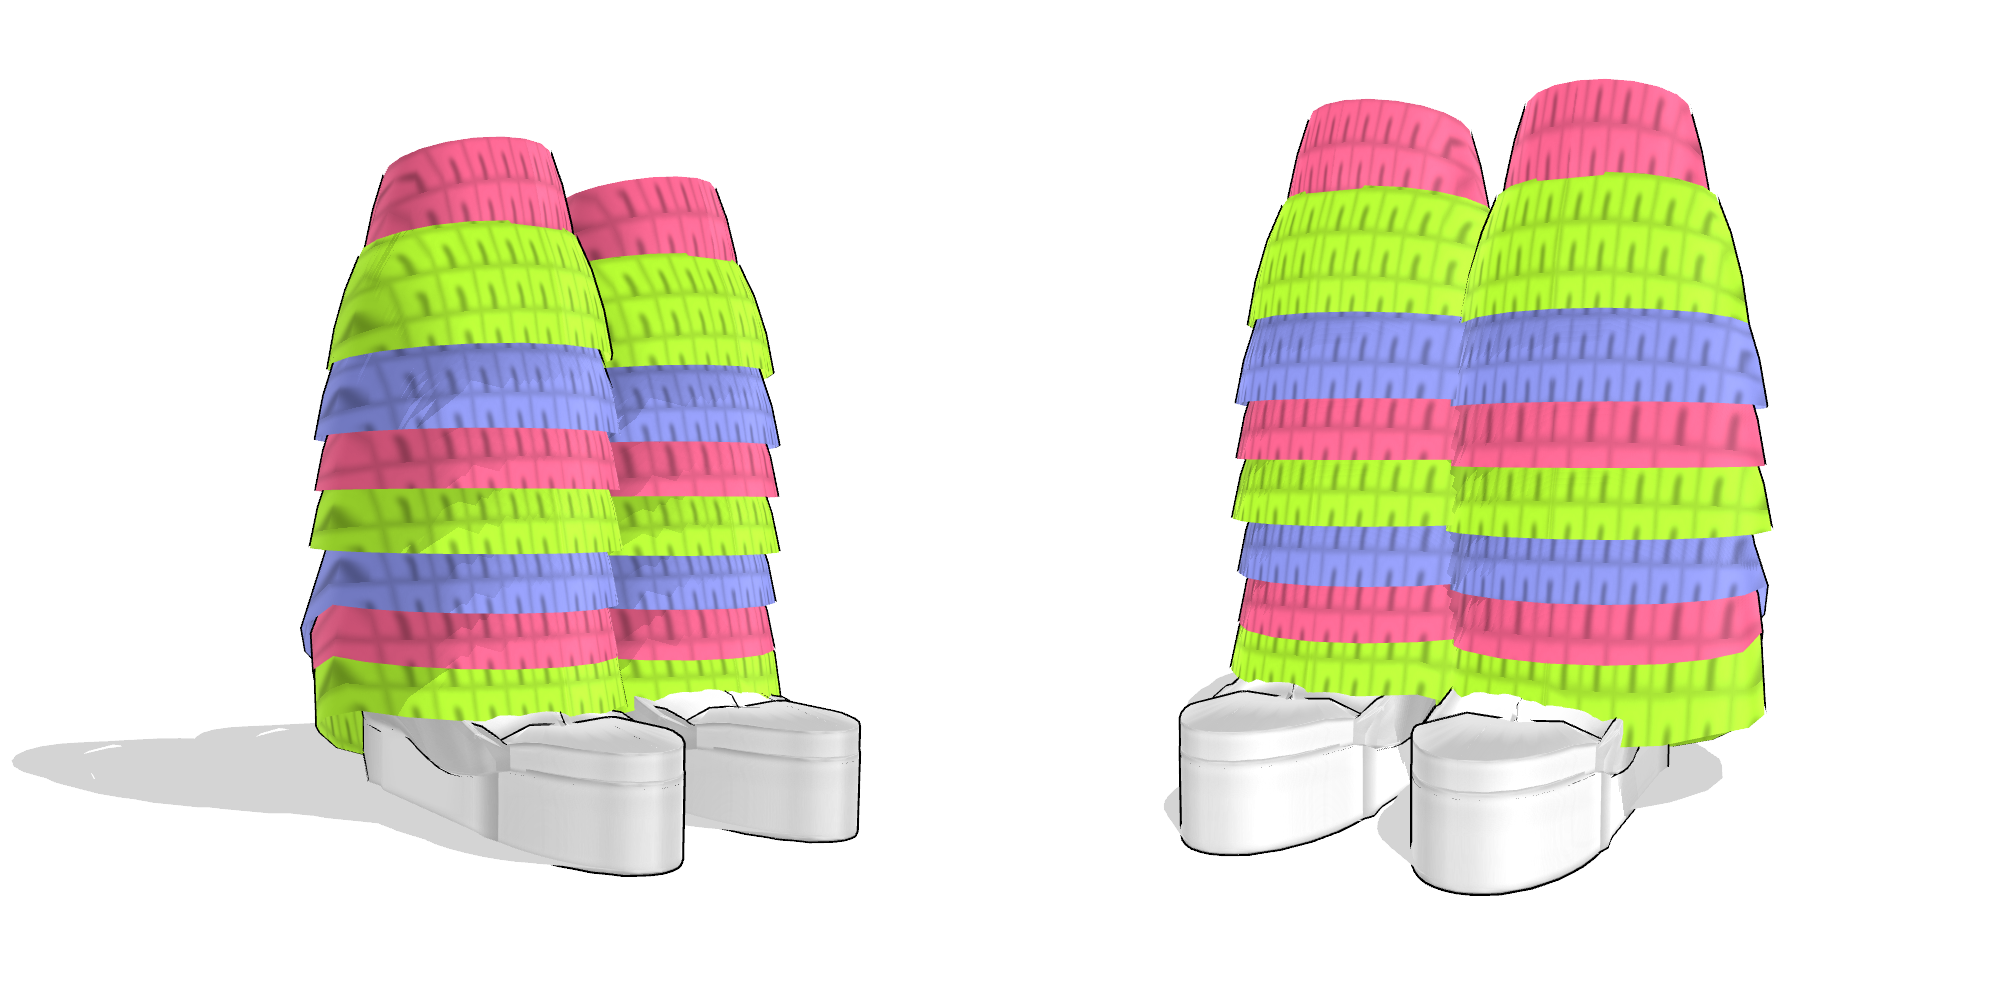 7cc3af9a5482f8 Feet - Boots on MMD-Mall - DeviantArt